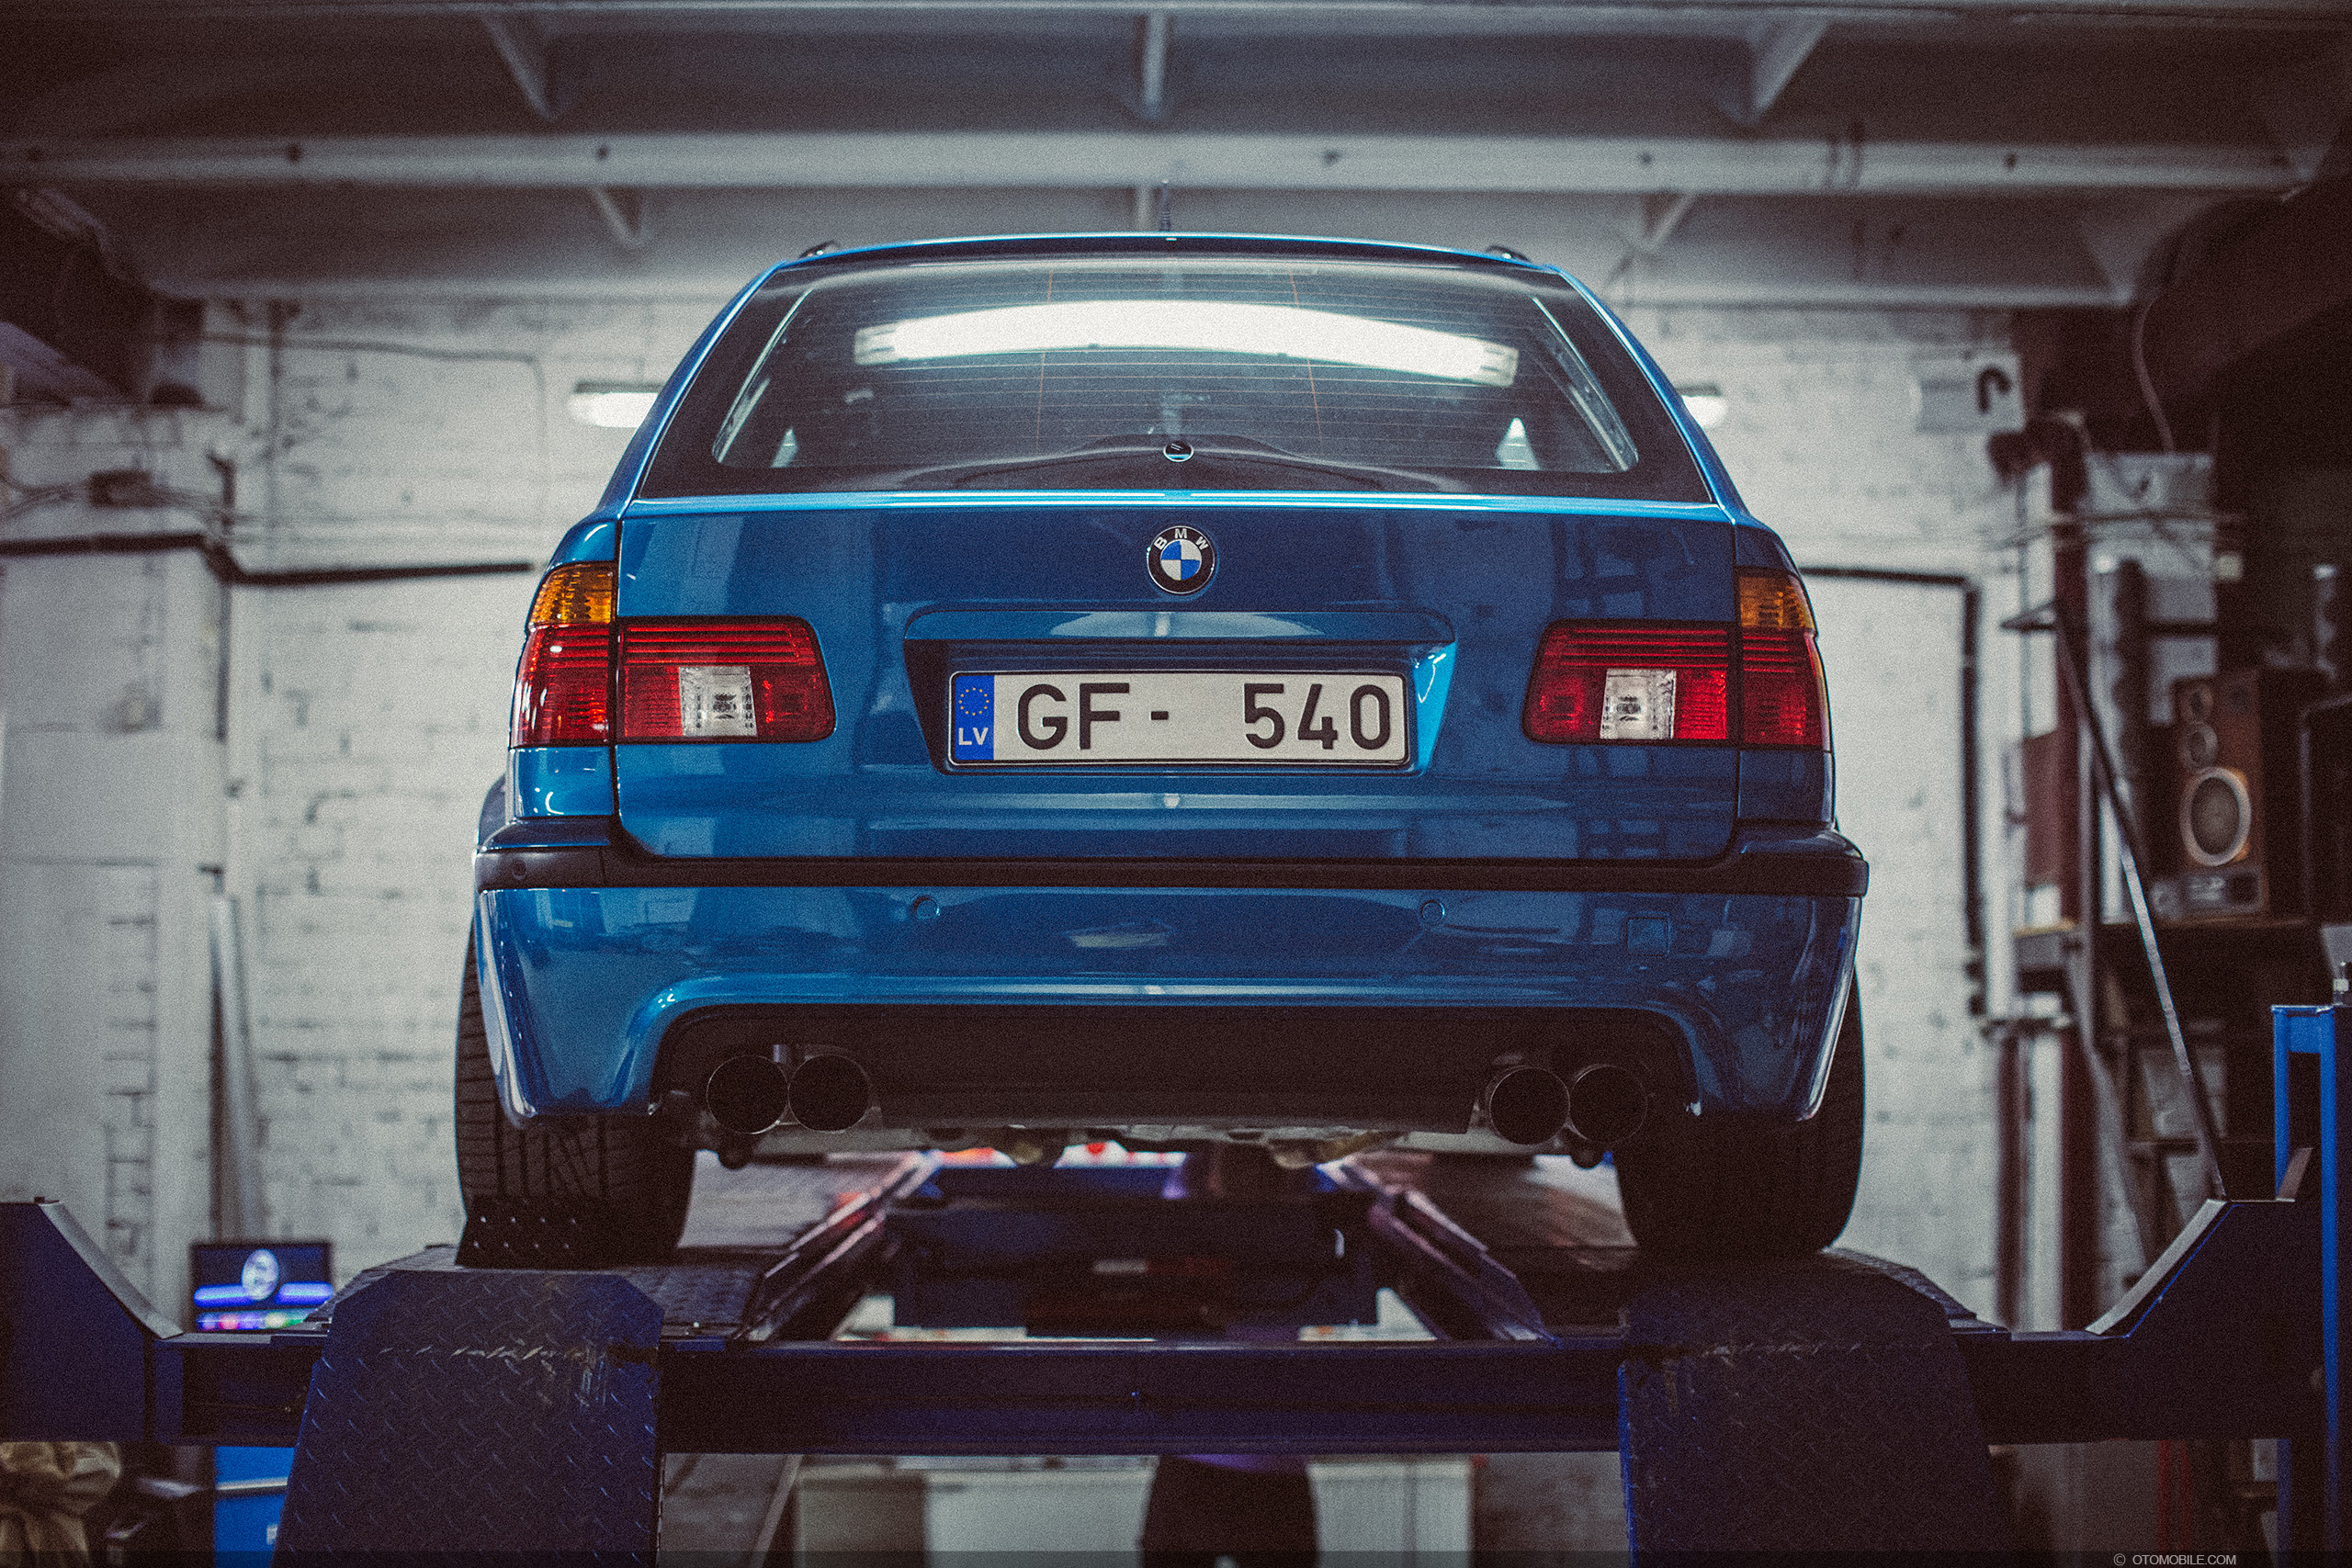 "BMW M5 E39 Touring Wide-Body ESS Supercharged ""BMW Individual Program"" 1 of 7 Atlantis Metallic with 1 of 1 Titanic Blau interior. Wheel alignment at Driftdarbnica, Riga, Latvia"